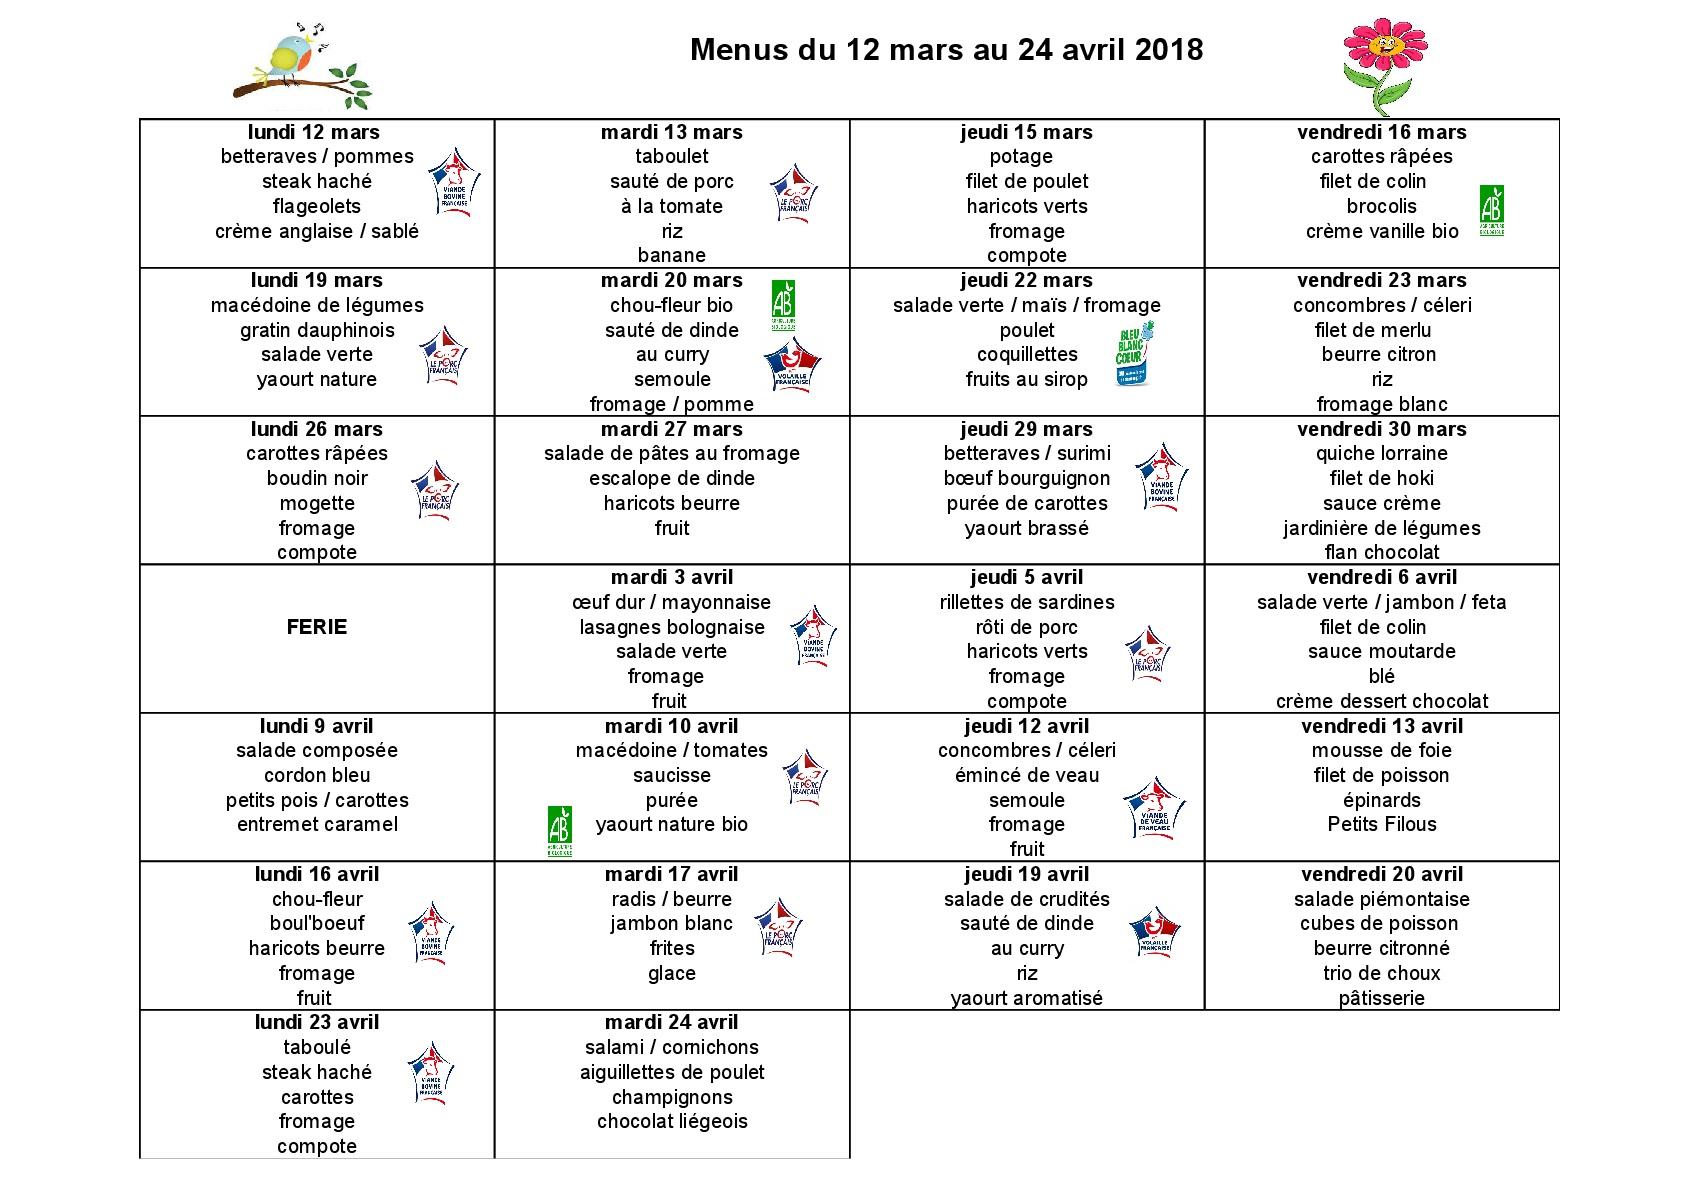 Menus cantine 12 mars au 24 avril 2018-001